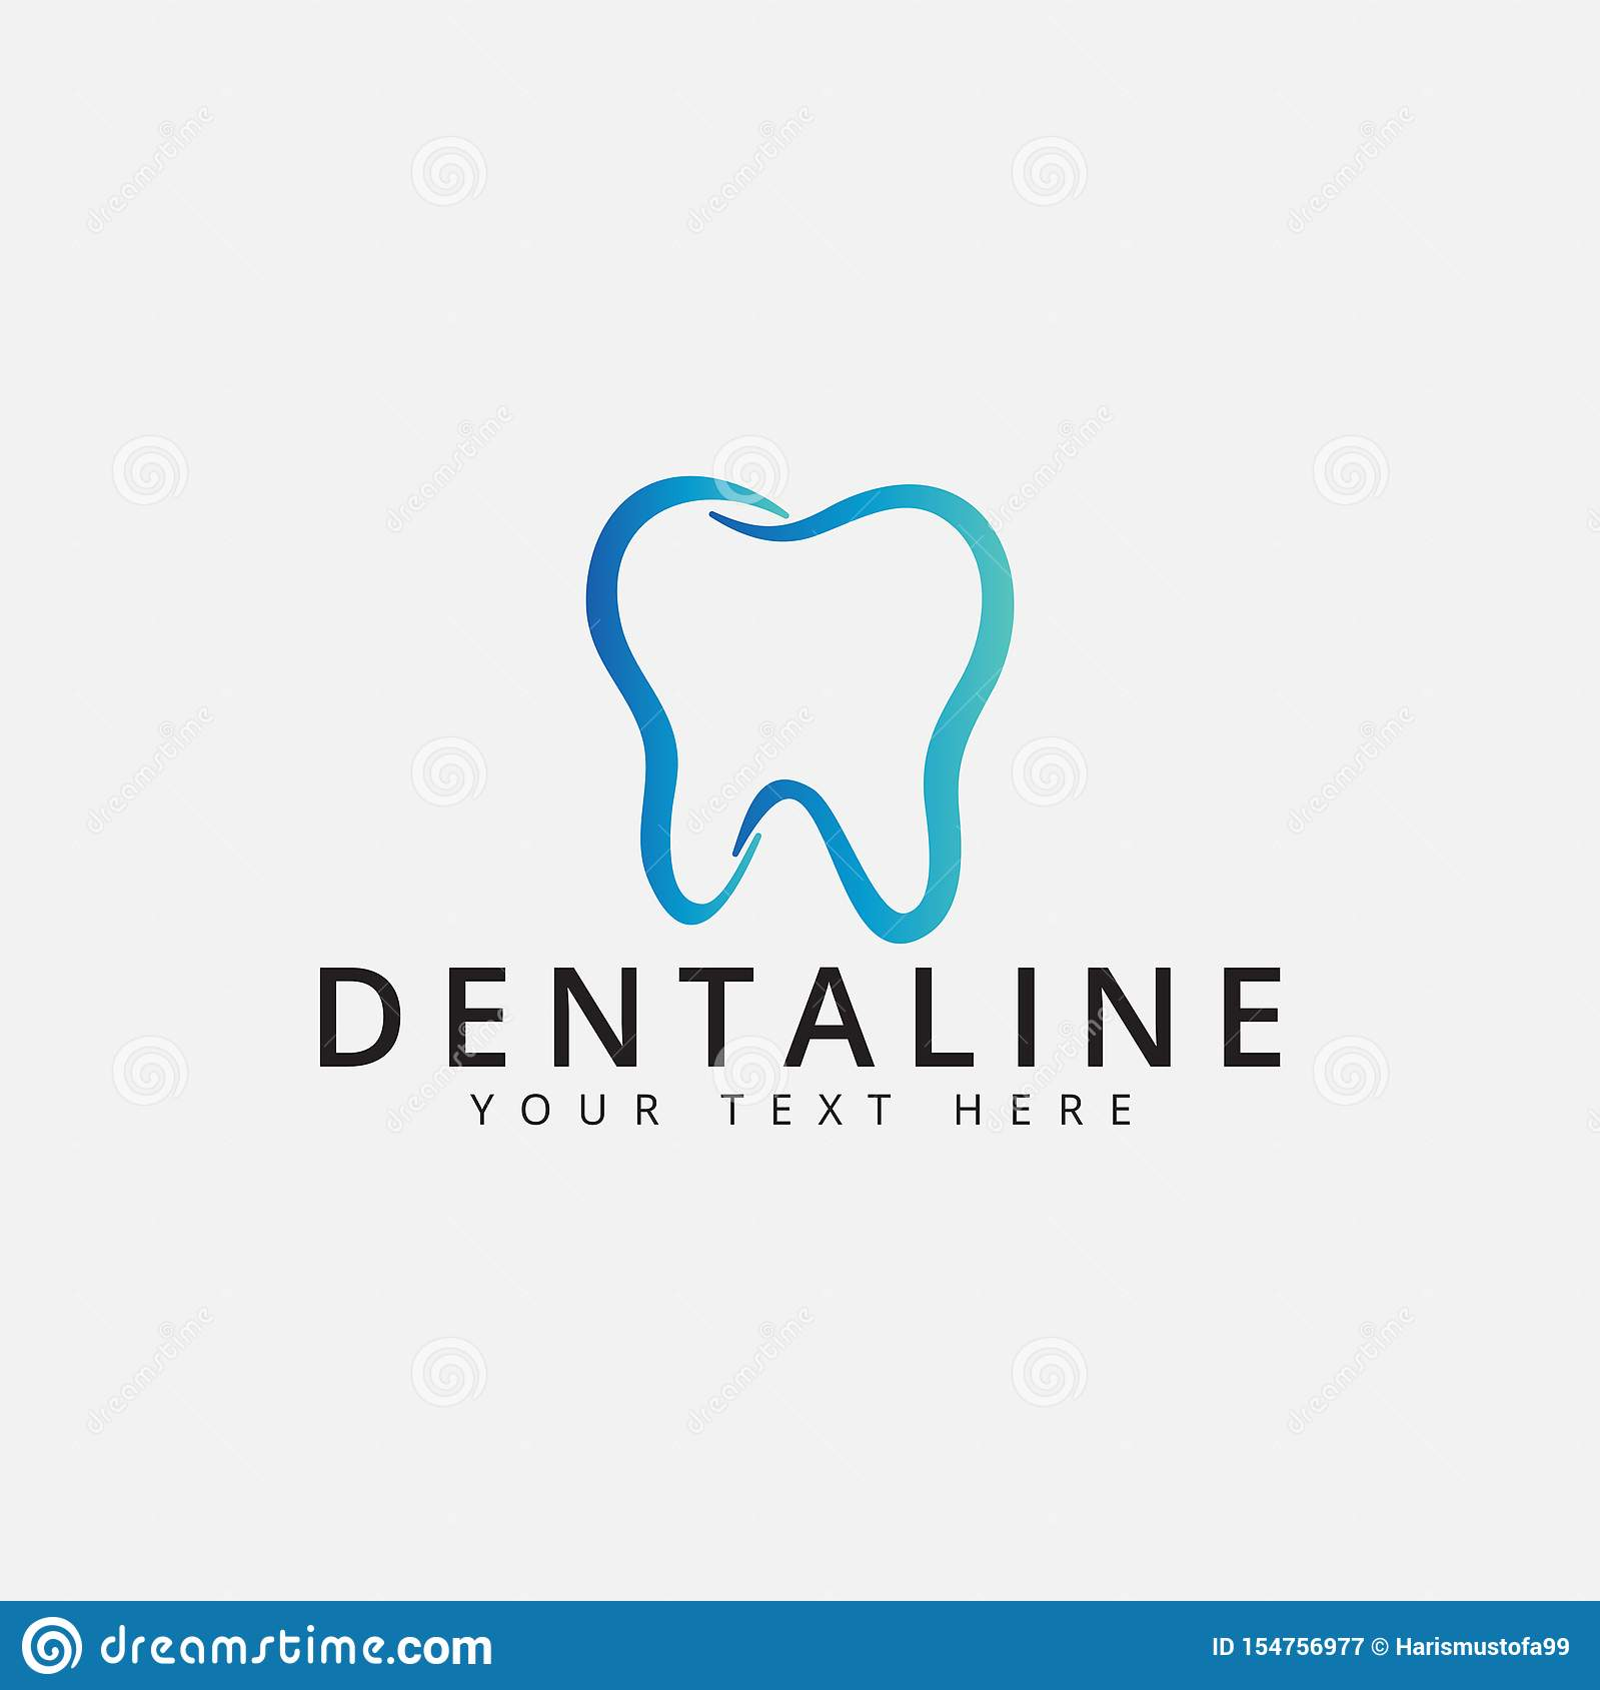 Dental logo design template vector isolated illustration